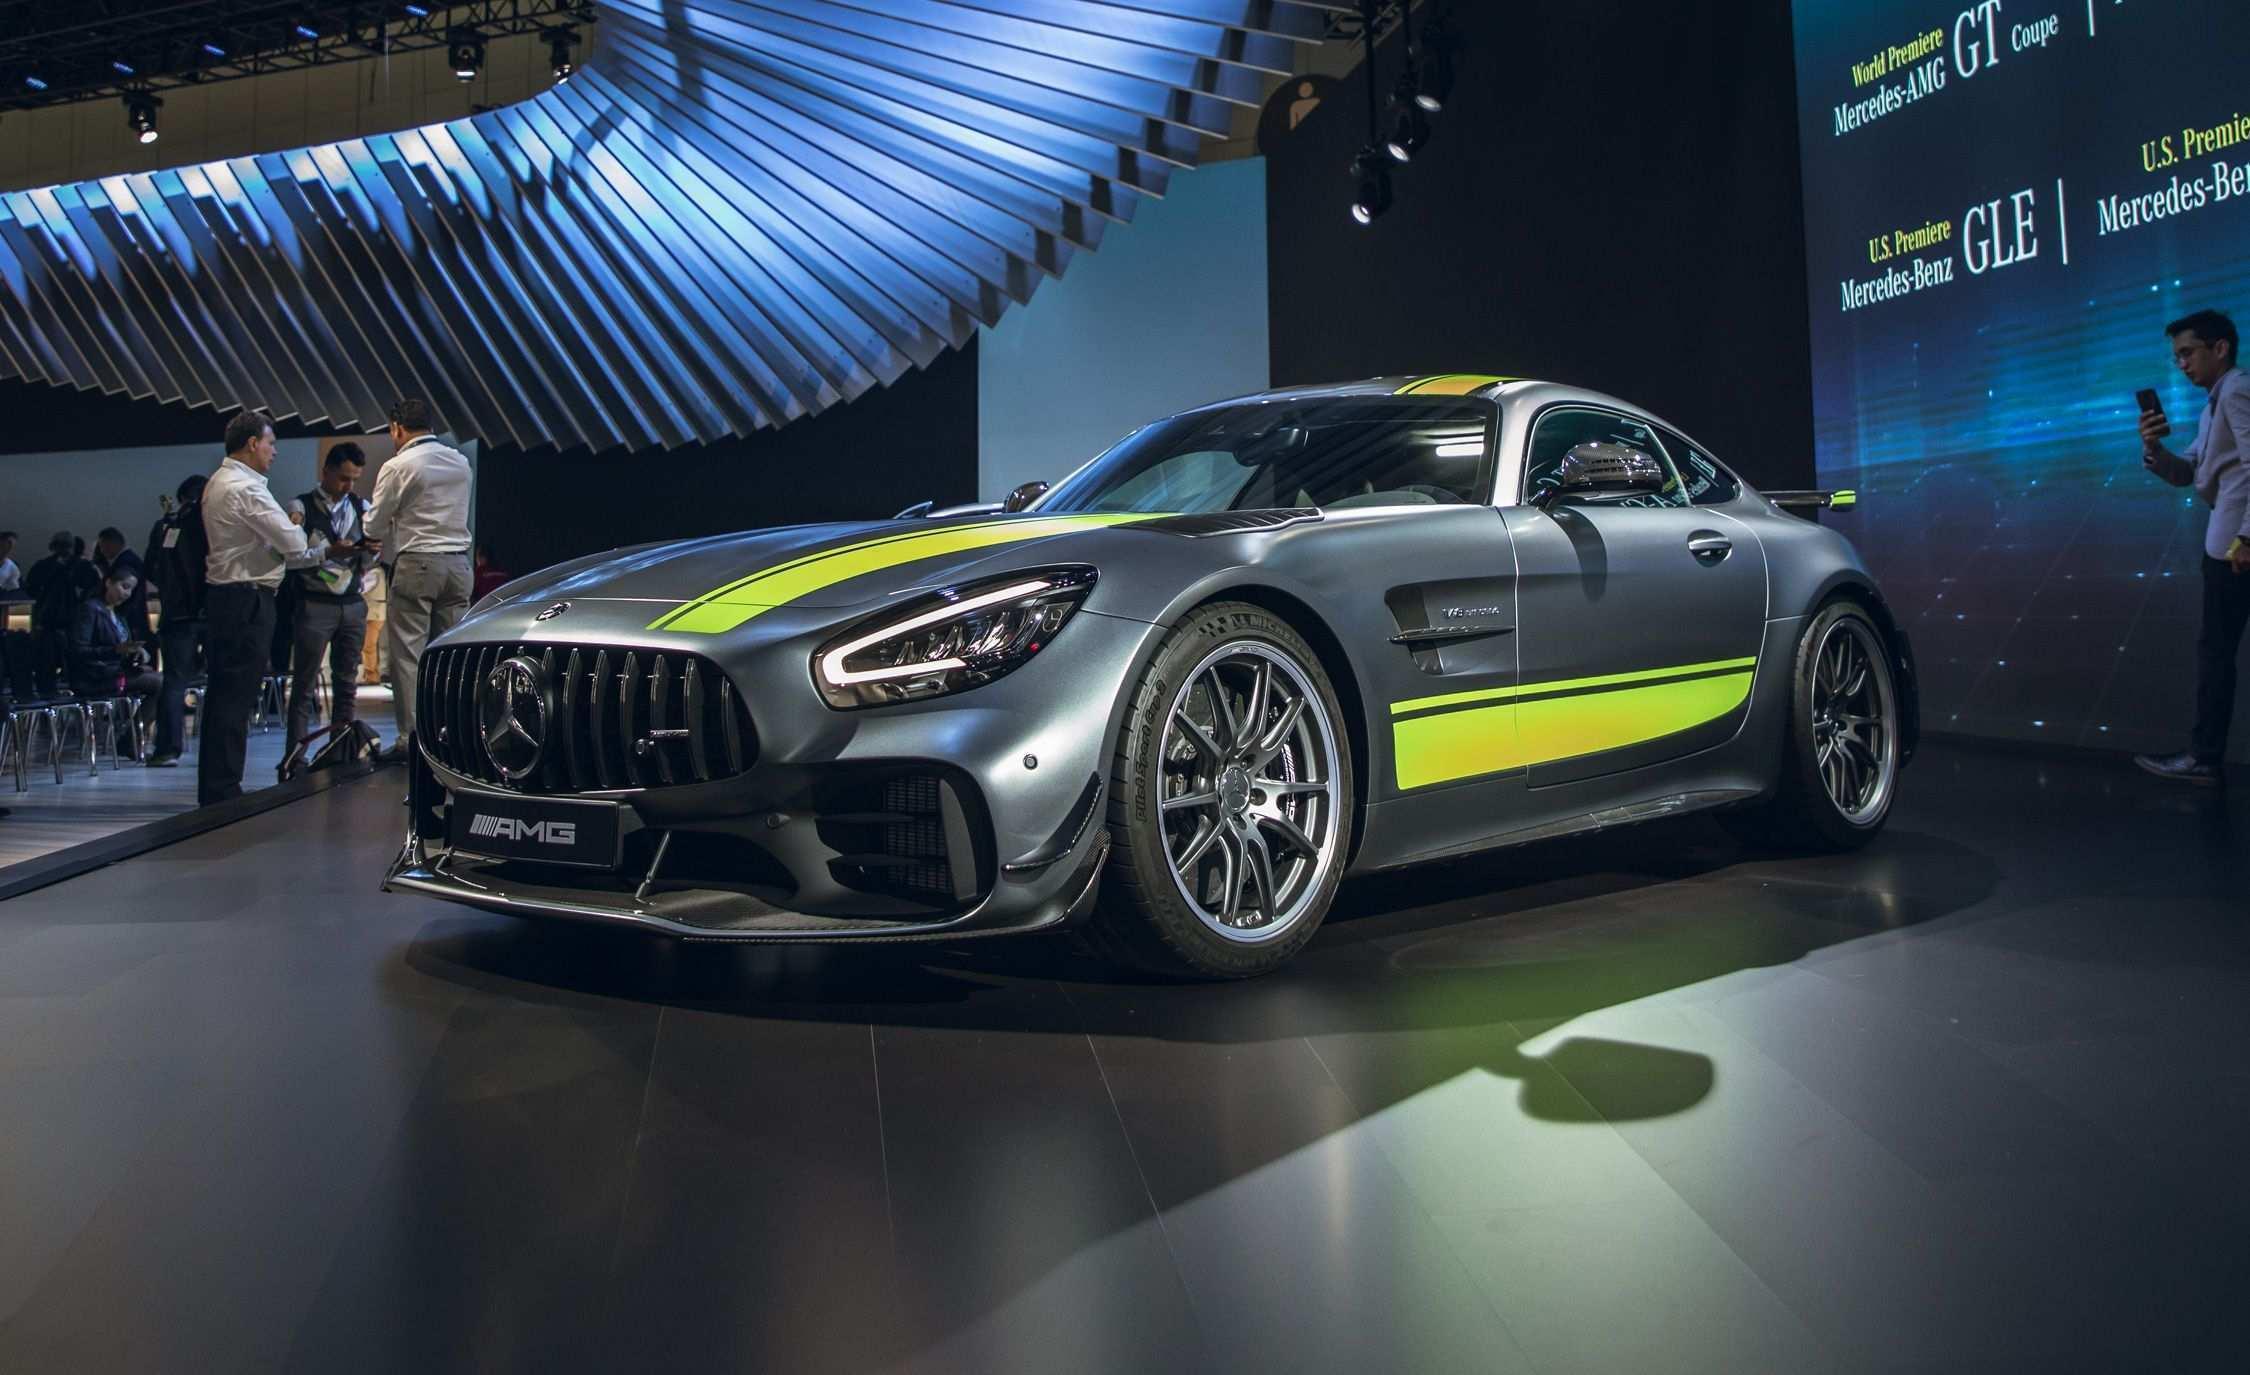 70 New Mercedes Benz 2020 Jeepeta Photos for Mercedes Benz 2020 Jeepeta